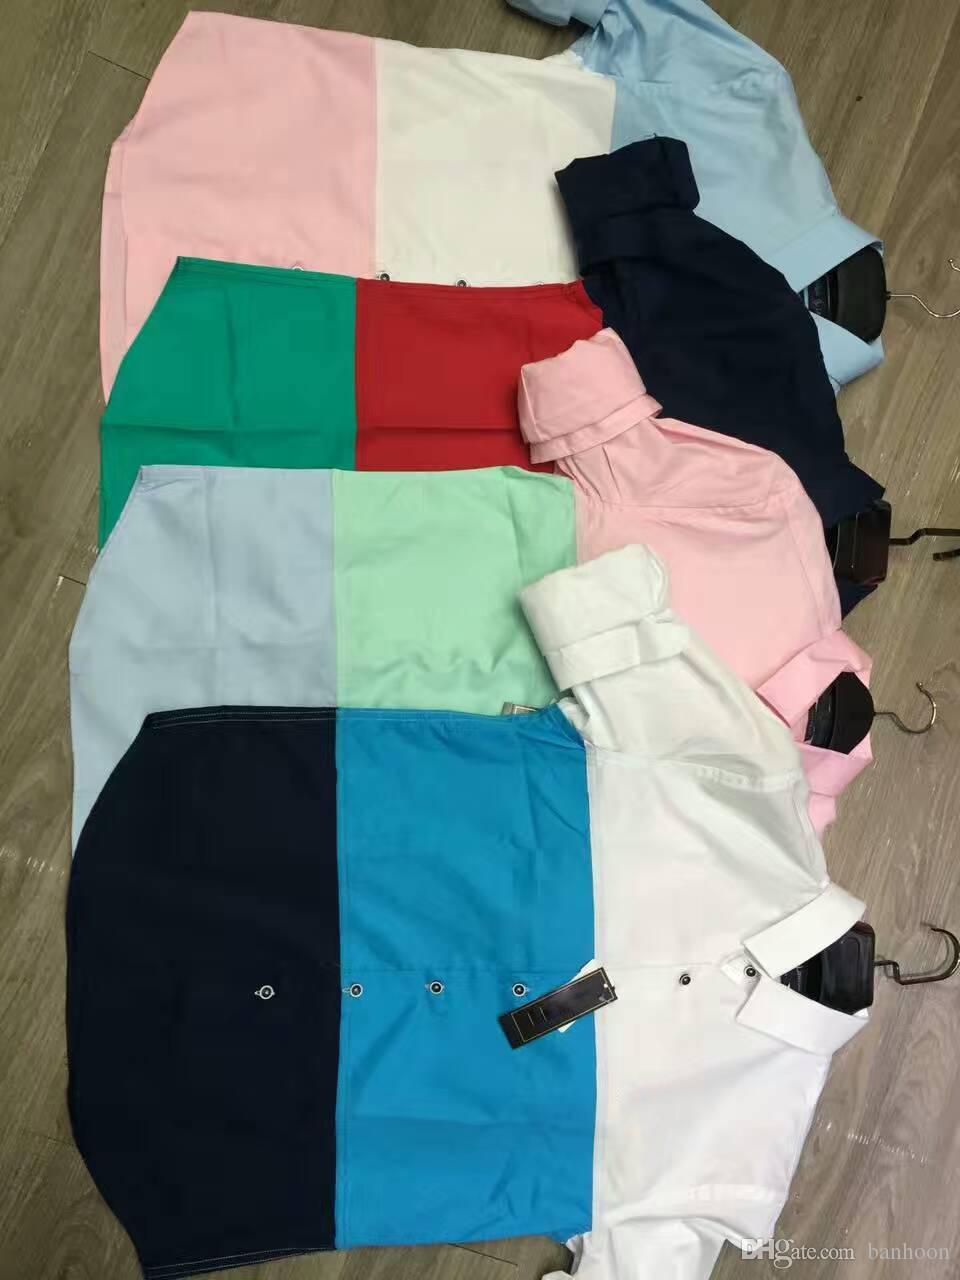 Shirt design new 2017 -  2017 New Autumn Shirts Short Tee Casual Custom Online Men Shirt Design Colour Mens Print Patchwork